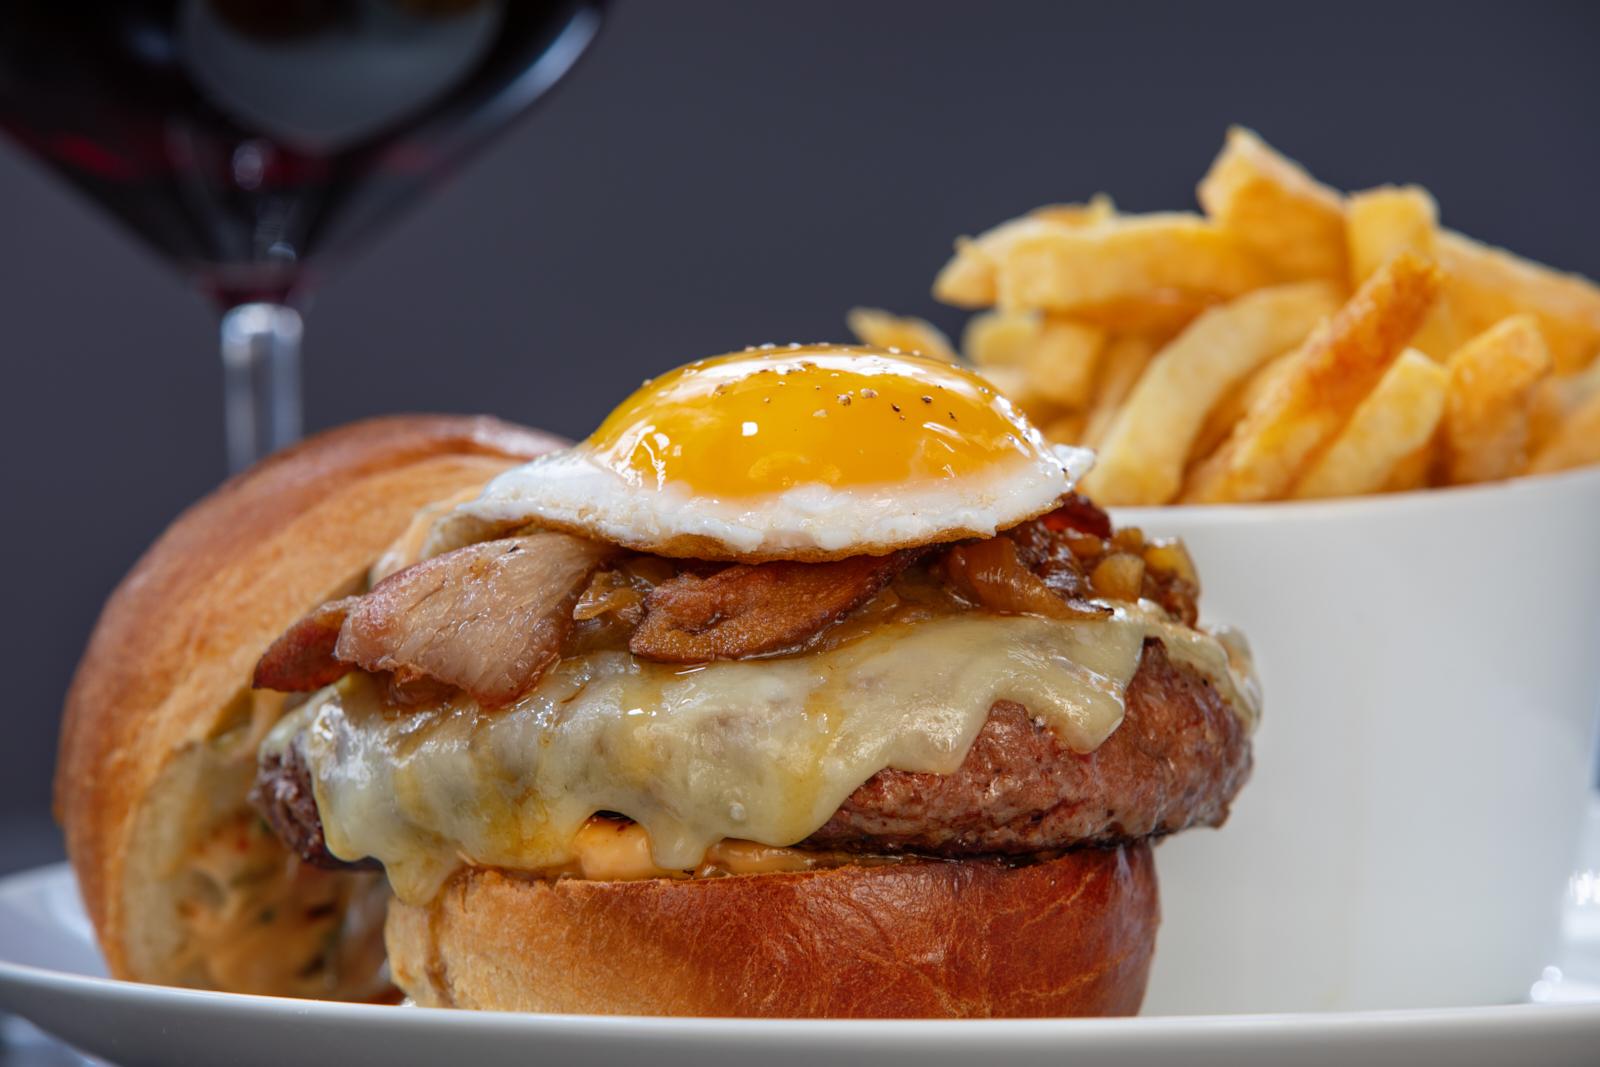 Burger 0229_web size.jpg